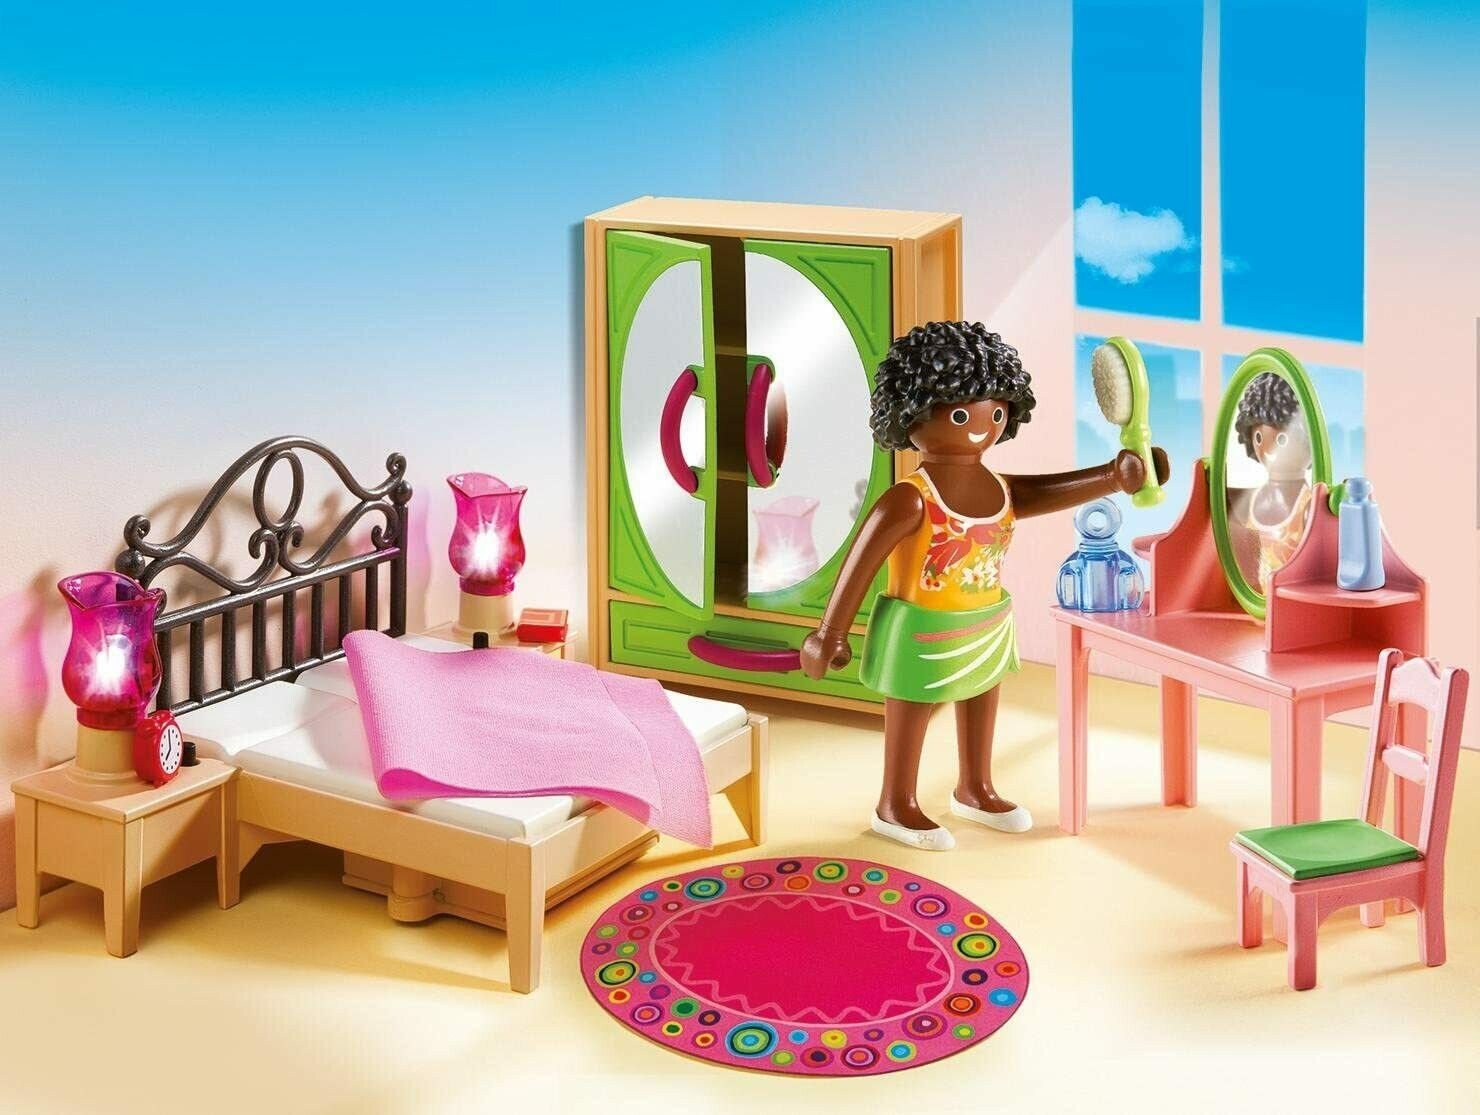 Playmobil; Master Bedroom